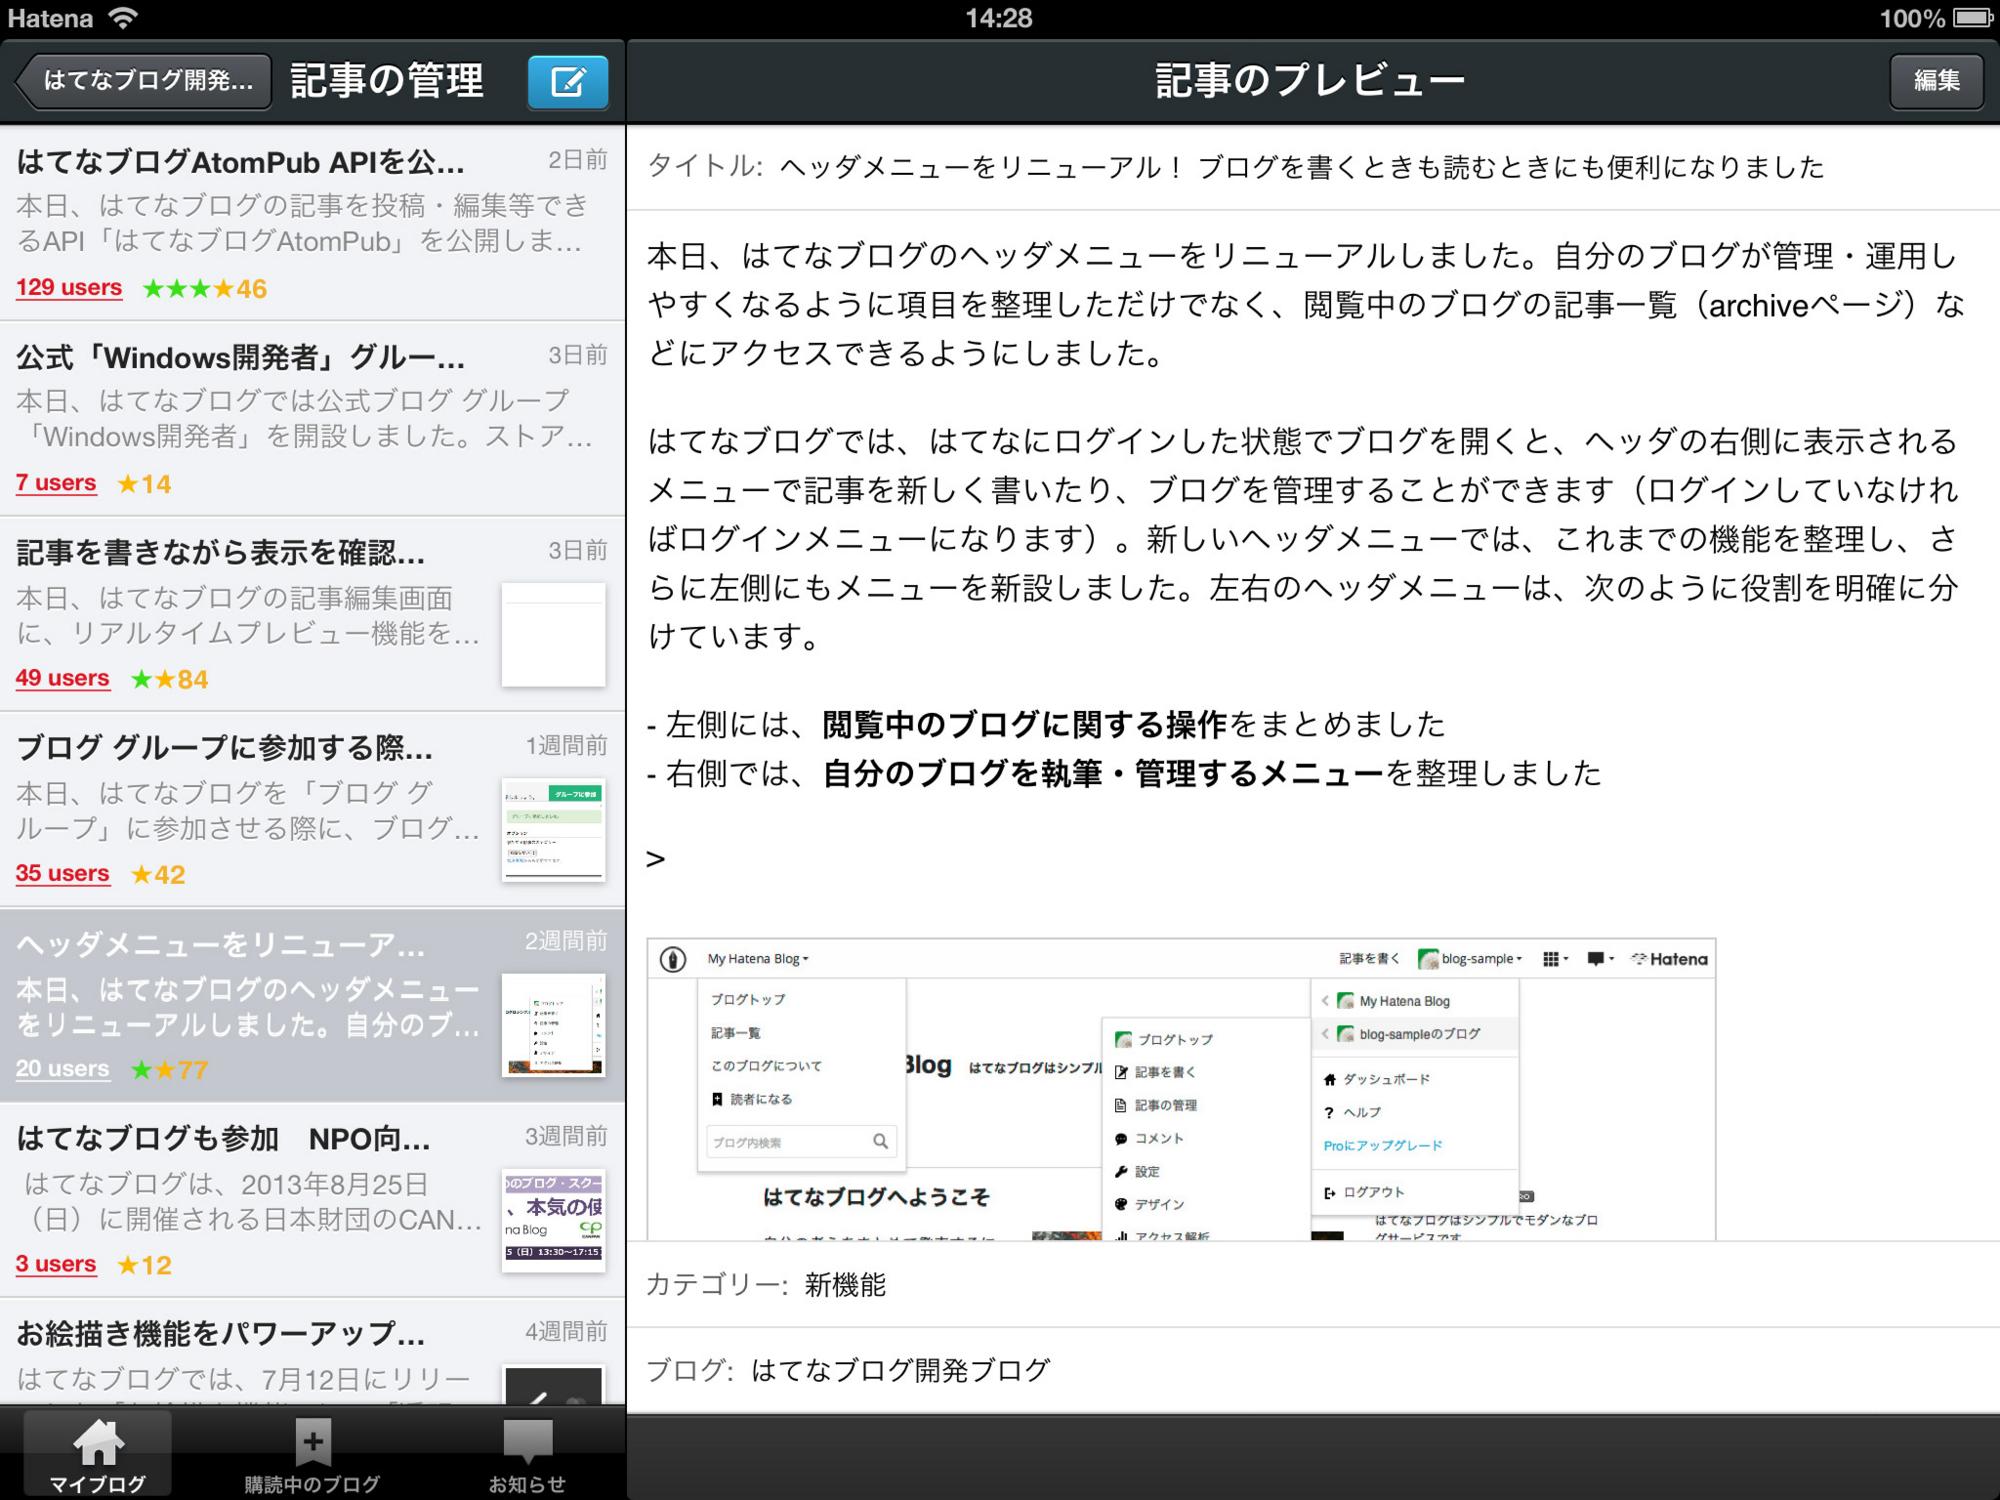 iOSアプリ「はてなブログ」バージョン2.0